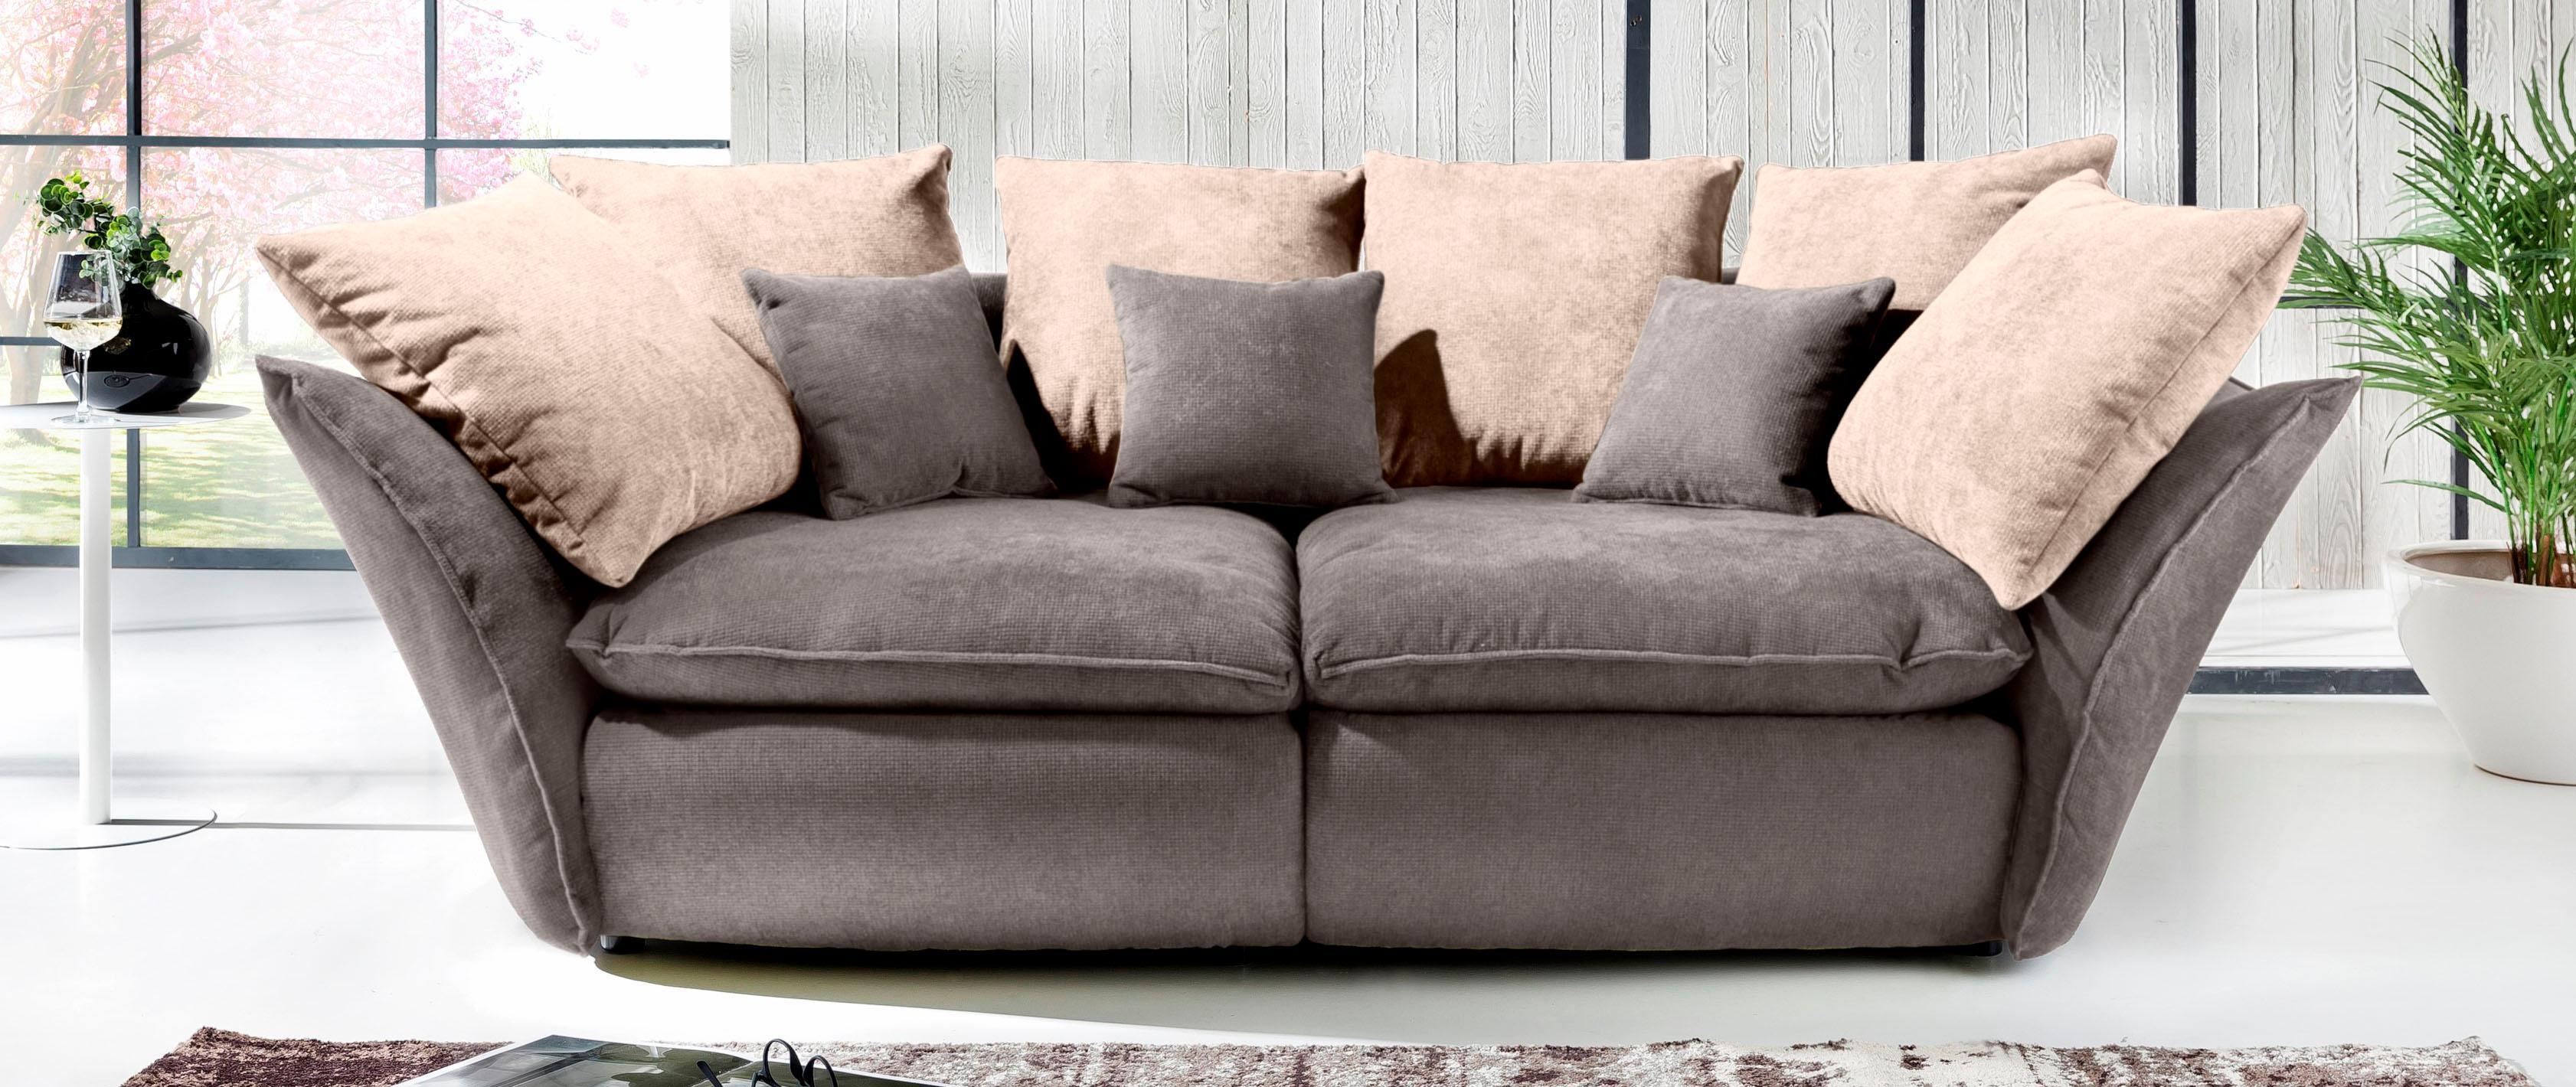 Home affaire Big Sofa Heartbeat bestellen